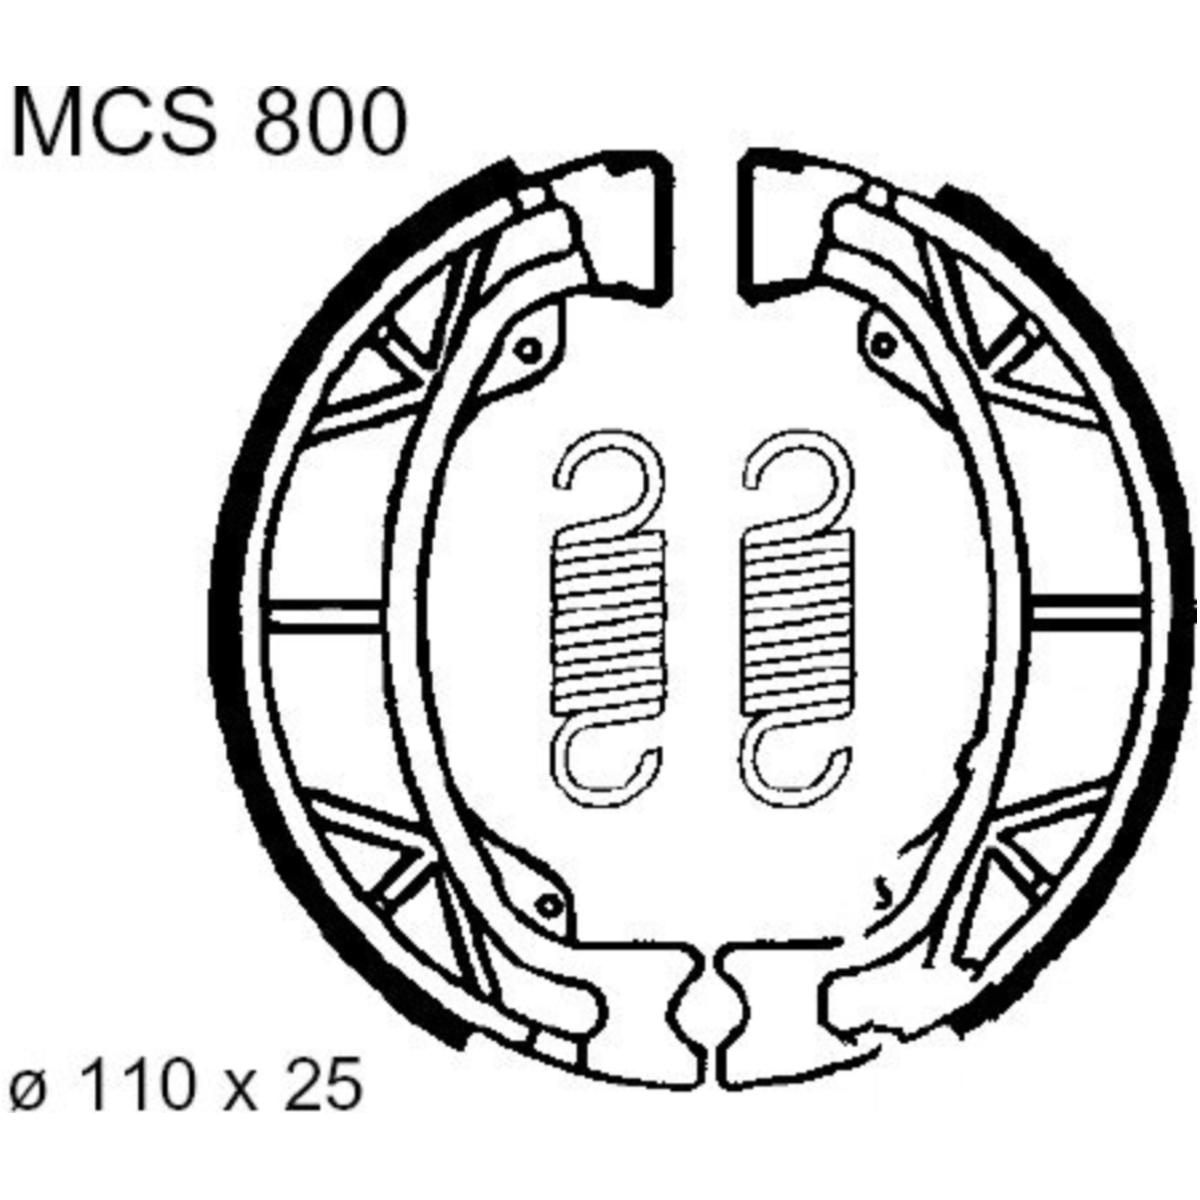 Brake shoes inc springs trw MCS800 für Peugeot Buxy 50 VGA 427 1996-1997, 3  PS, 2,2 kw